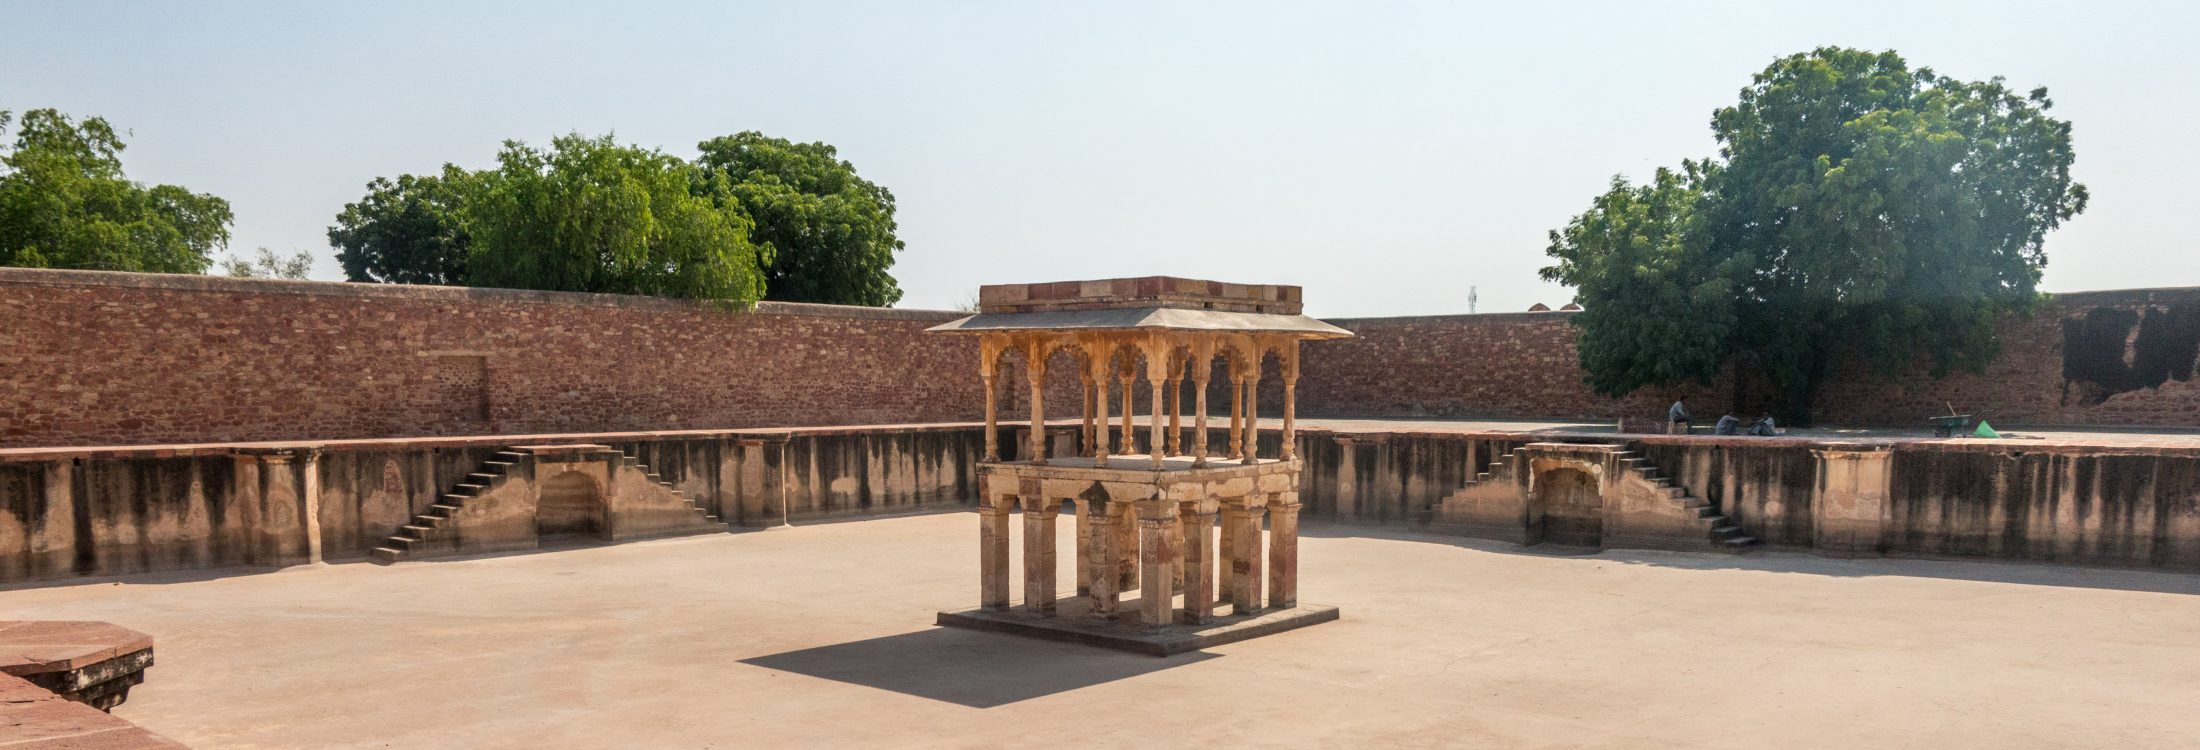 Nagaur Fort Rajasthan   20